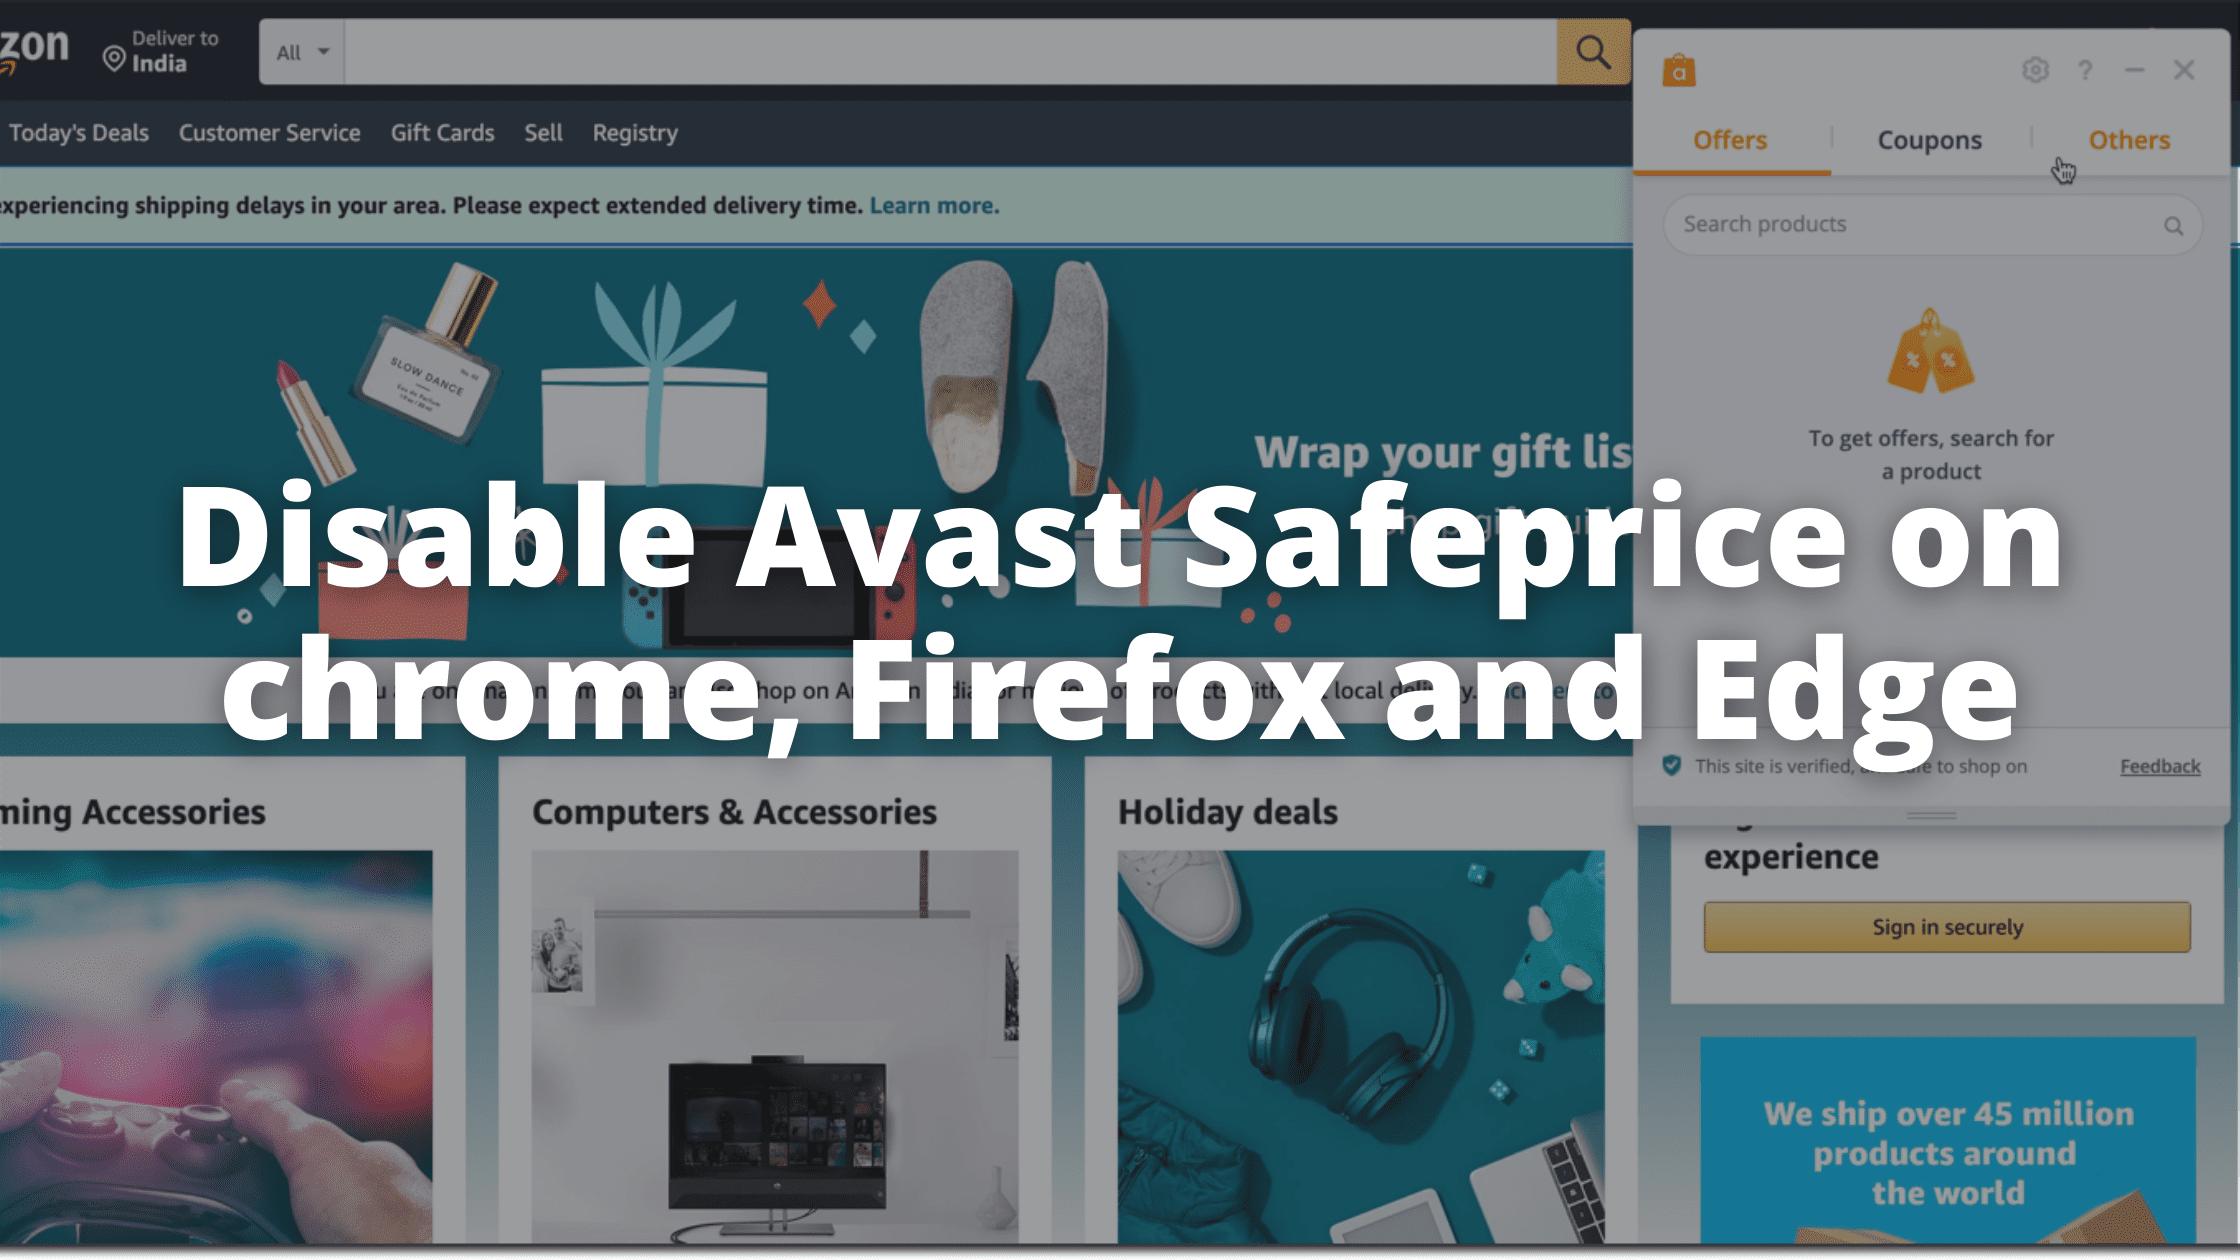 Disable Avast Safeprice